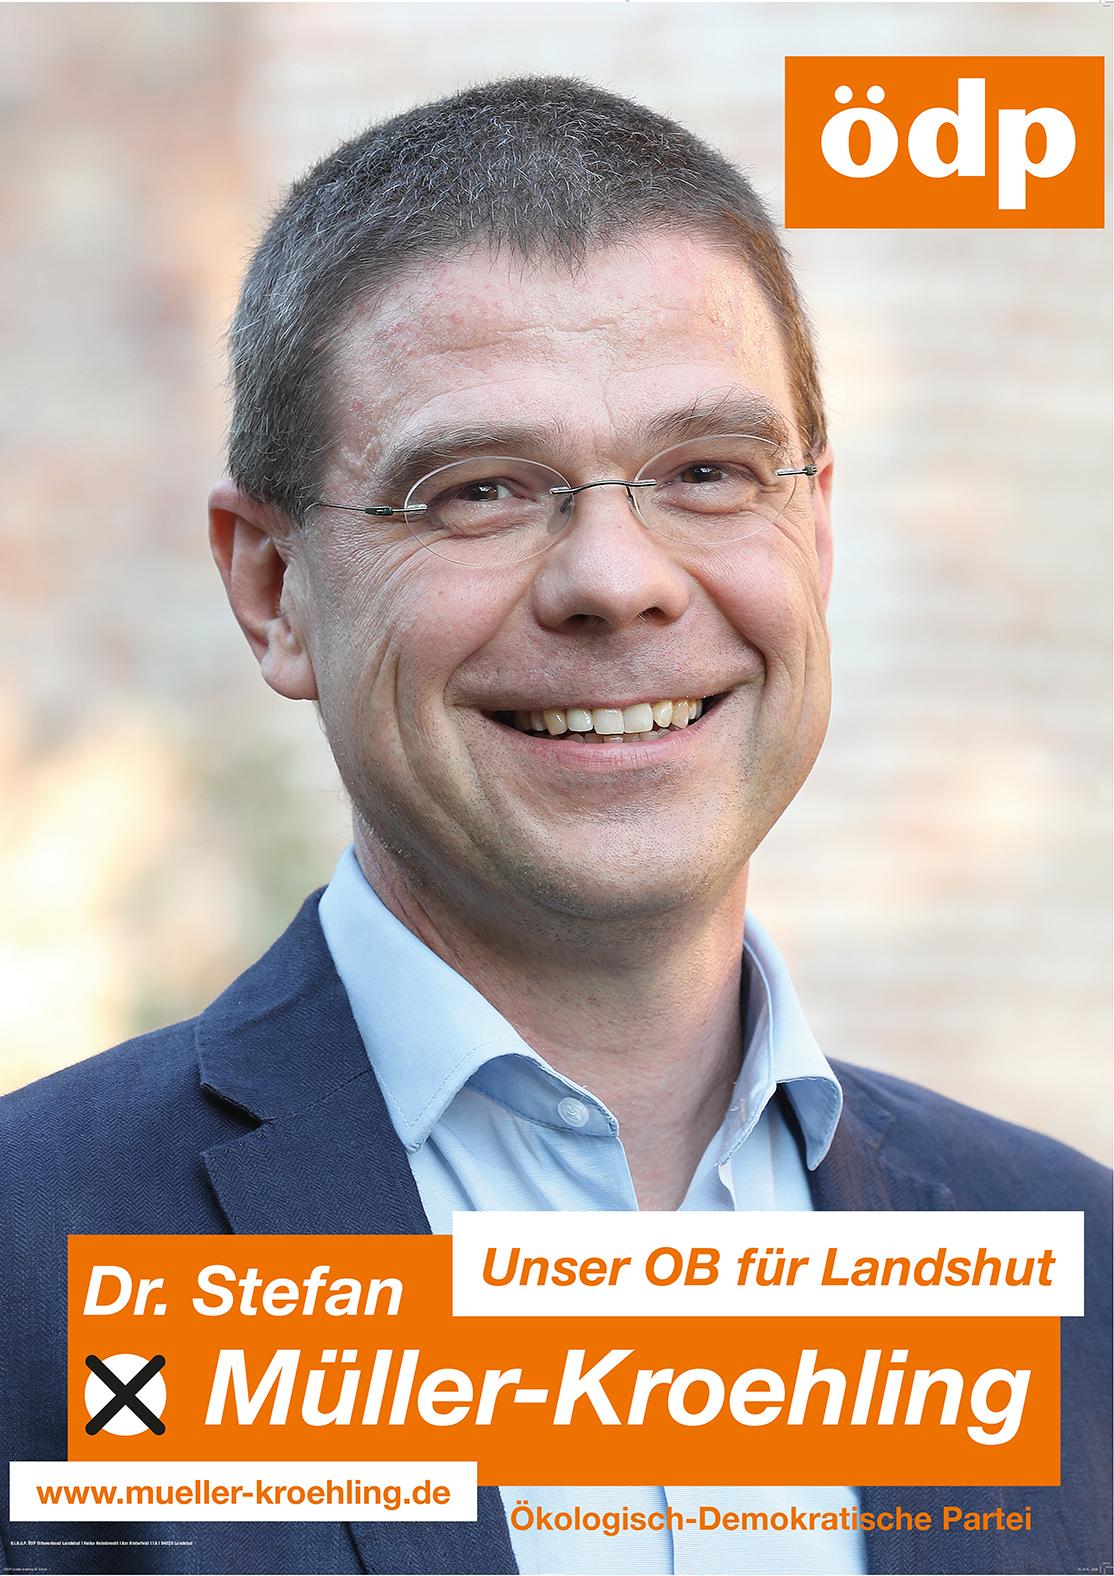 Offizielles Wahlplakat von Dr. Stefan Müller-Kroehling